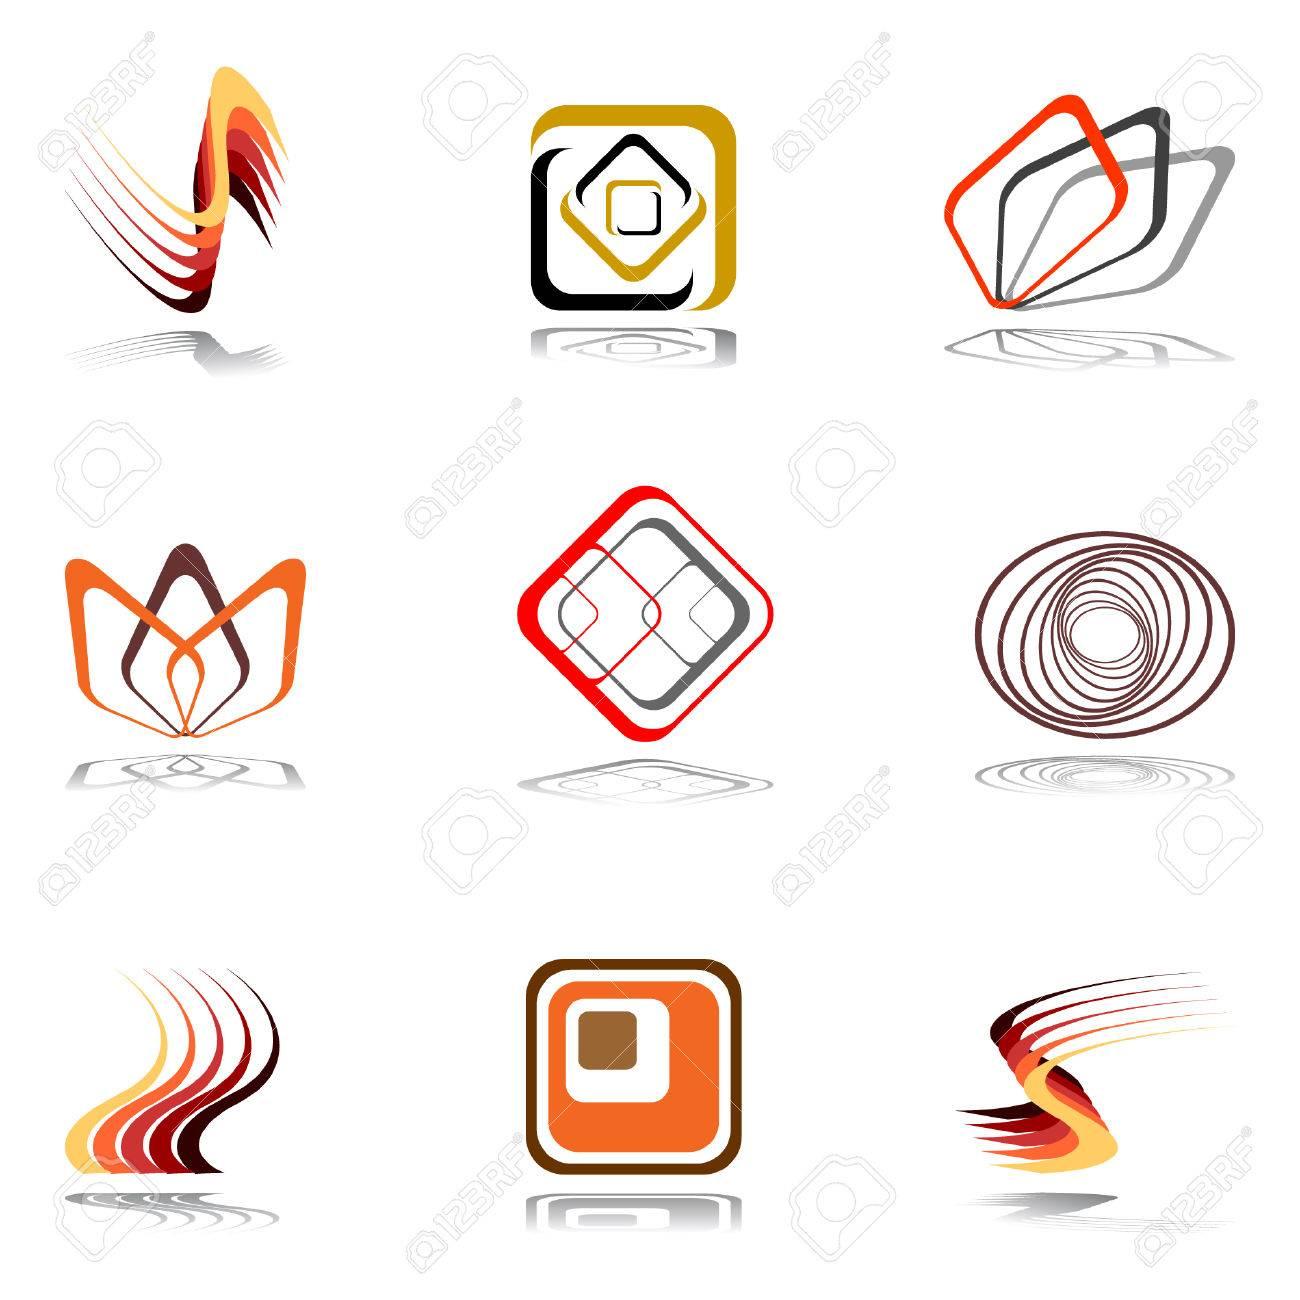 Design elements in warm colors. Set 15. Stock Vector - 7019590